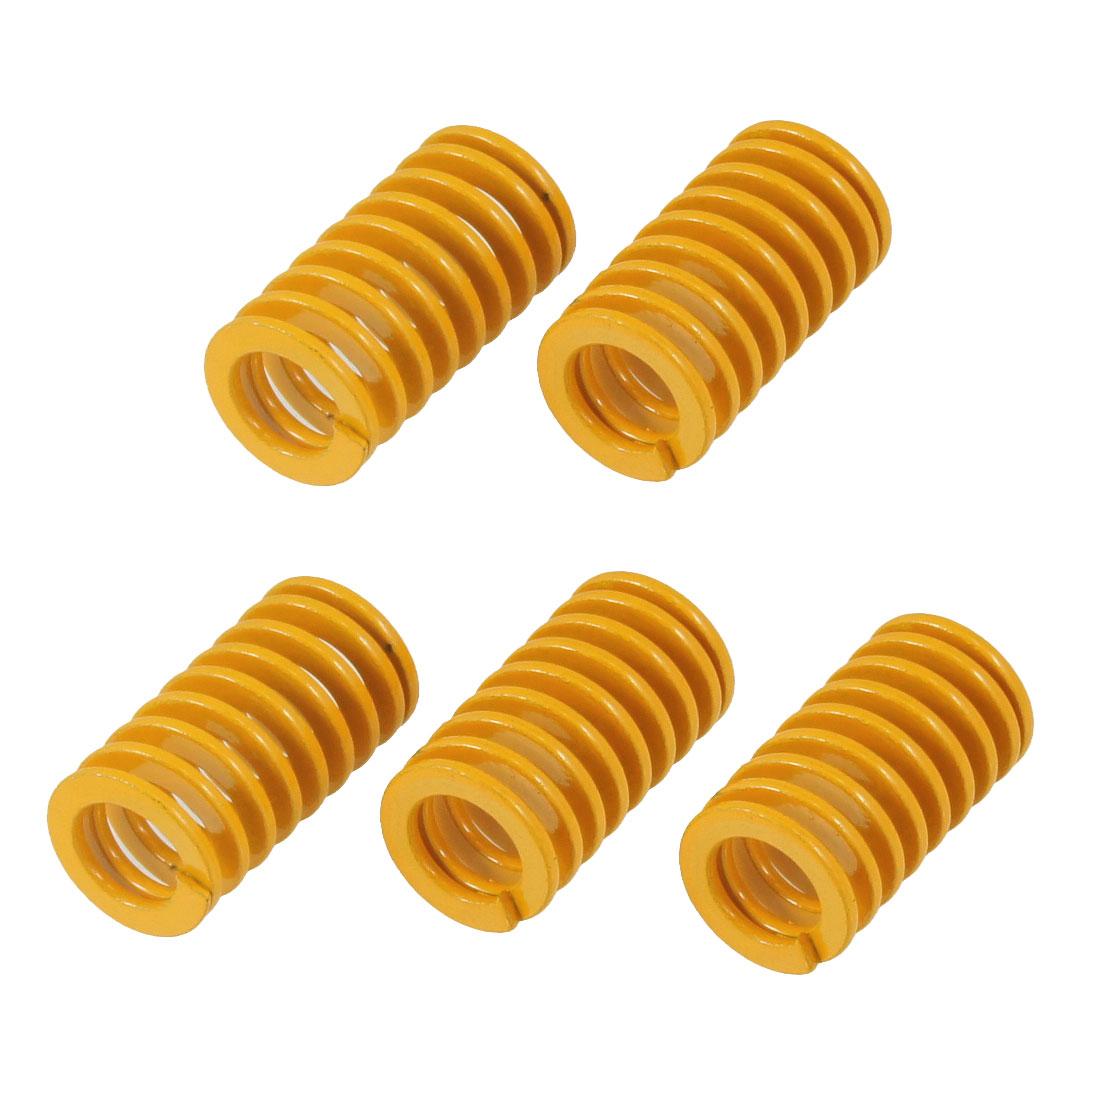 5 Pcs 14mm x 7.5mm x 25mm Spiral Metal Stamping Compression Die Spring